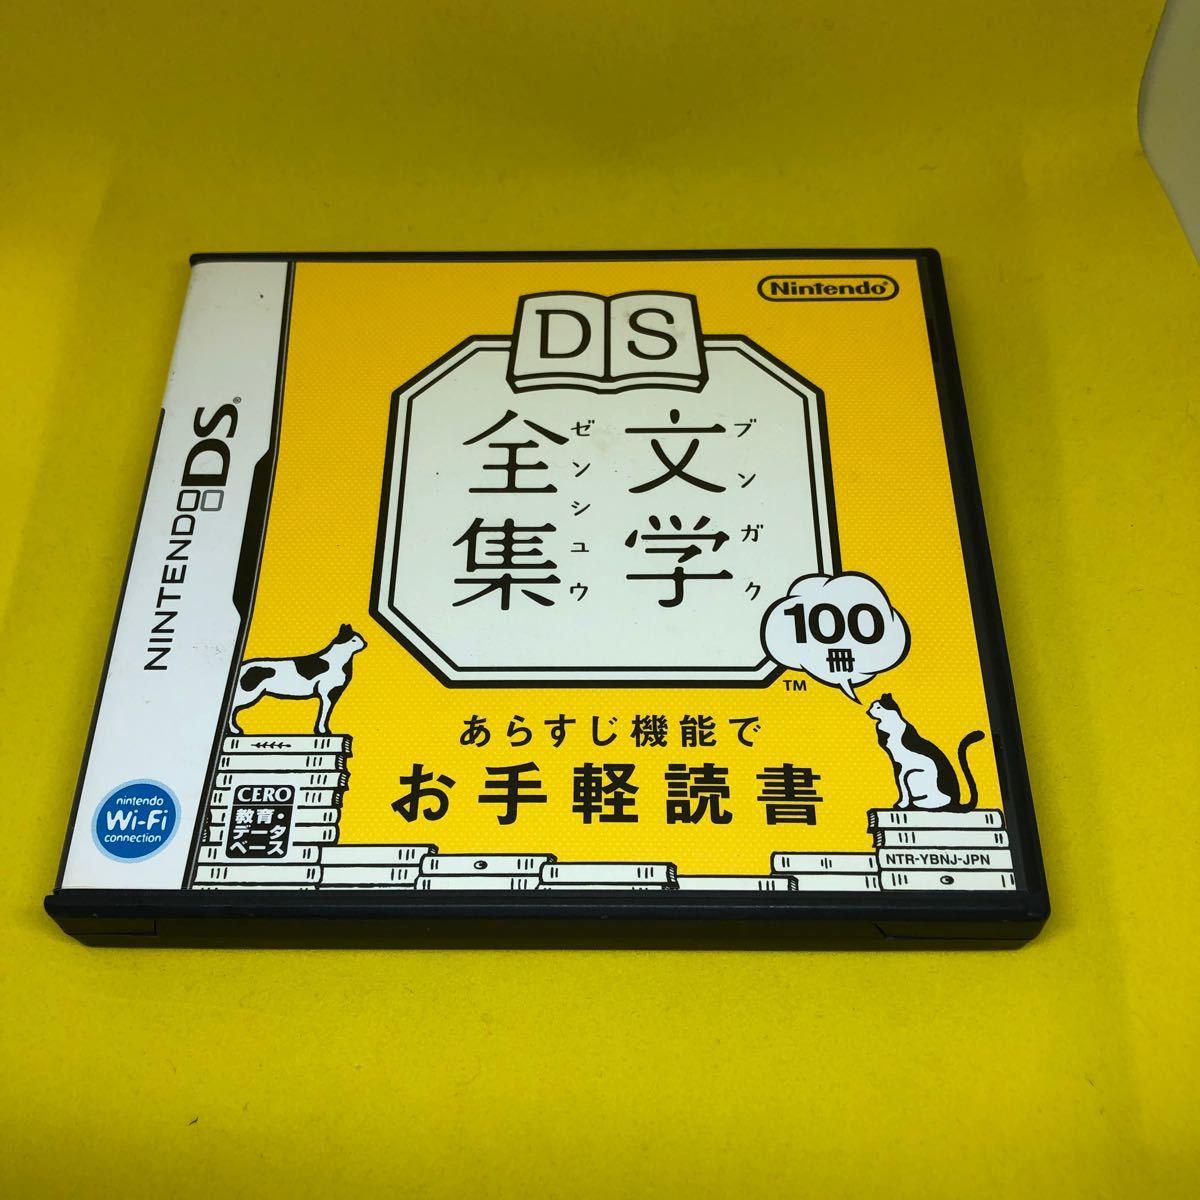 【DS】 Newスーパーマリオブラザーズ など3個まとめて